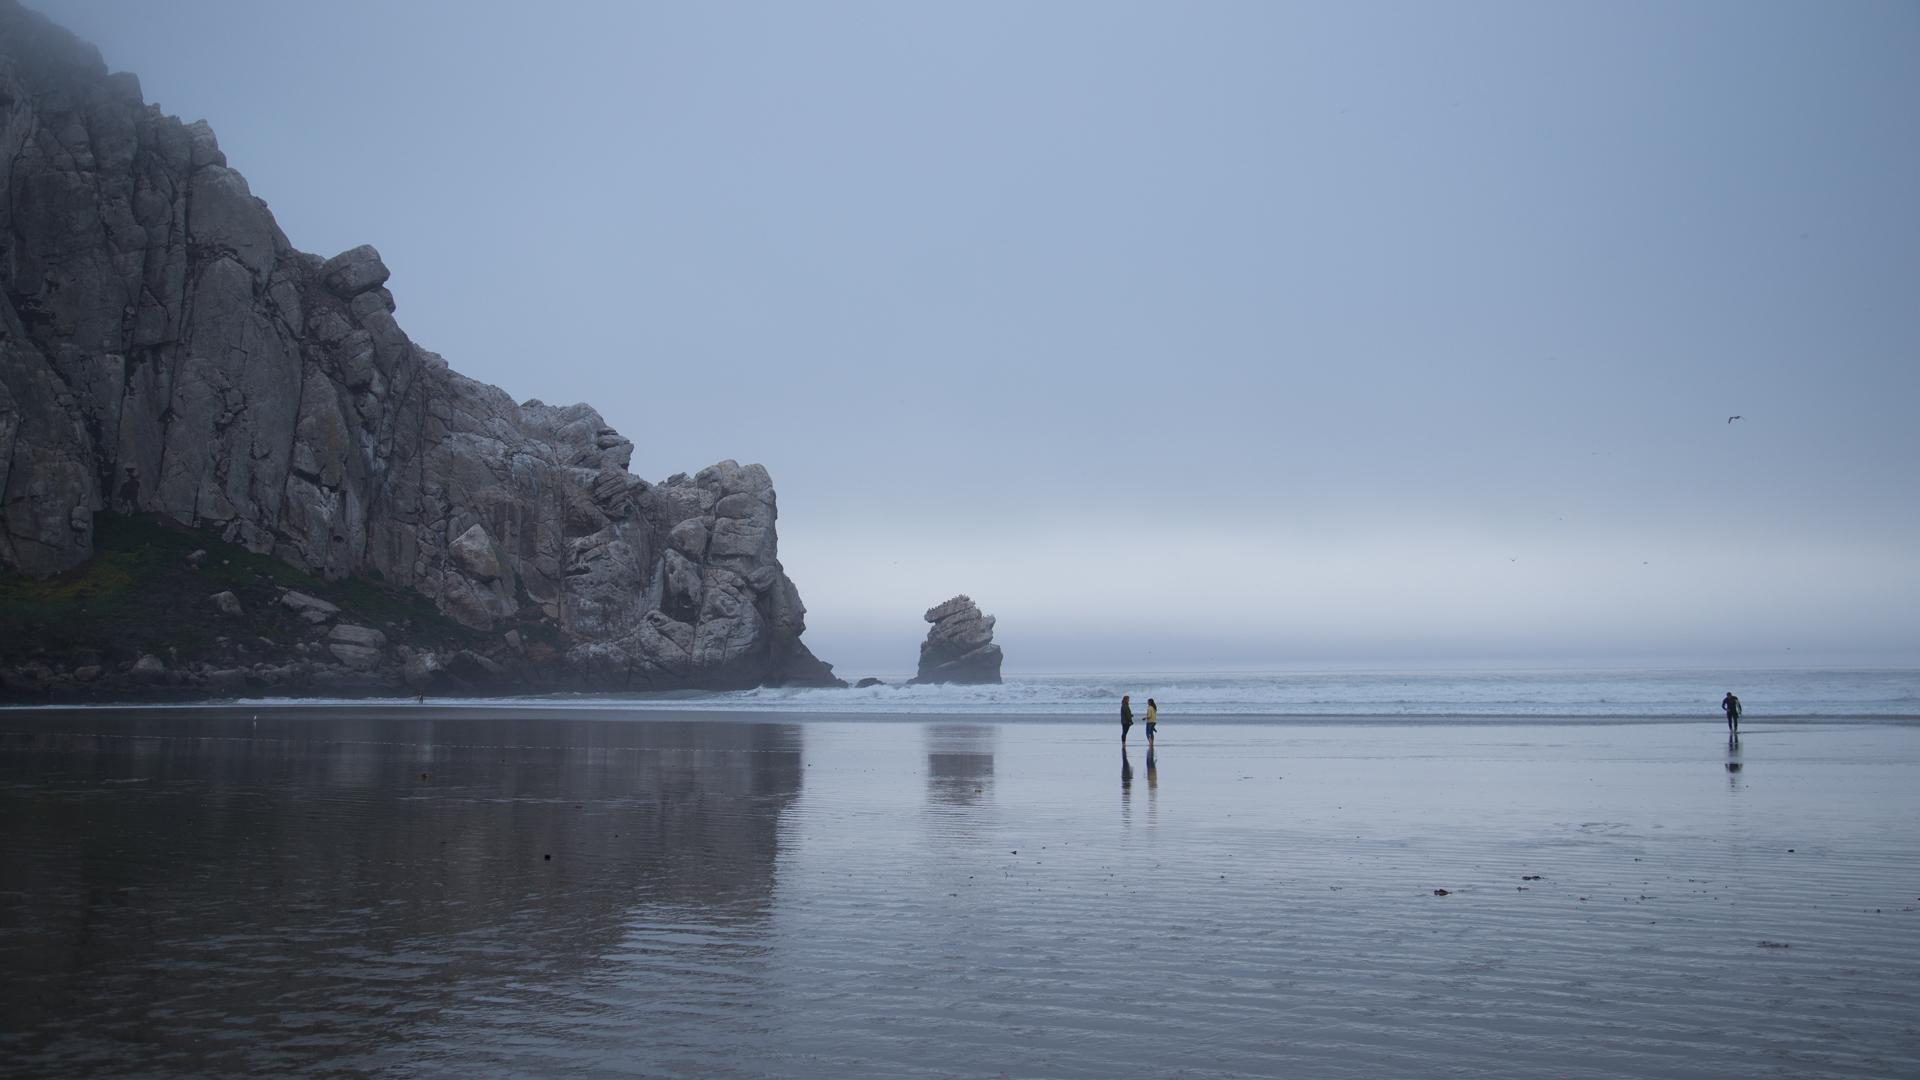 Entangled in the Life Cycle, San Luis Obispo, 2014